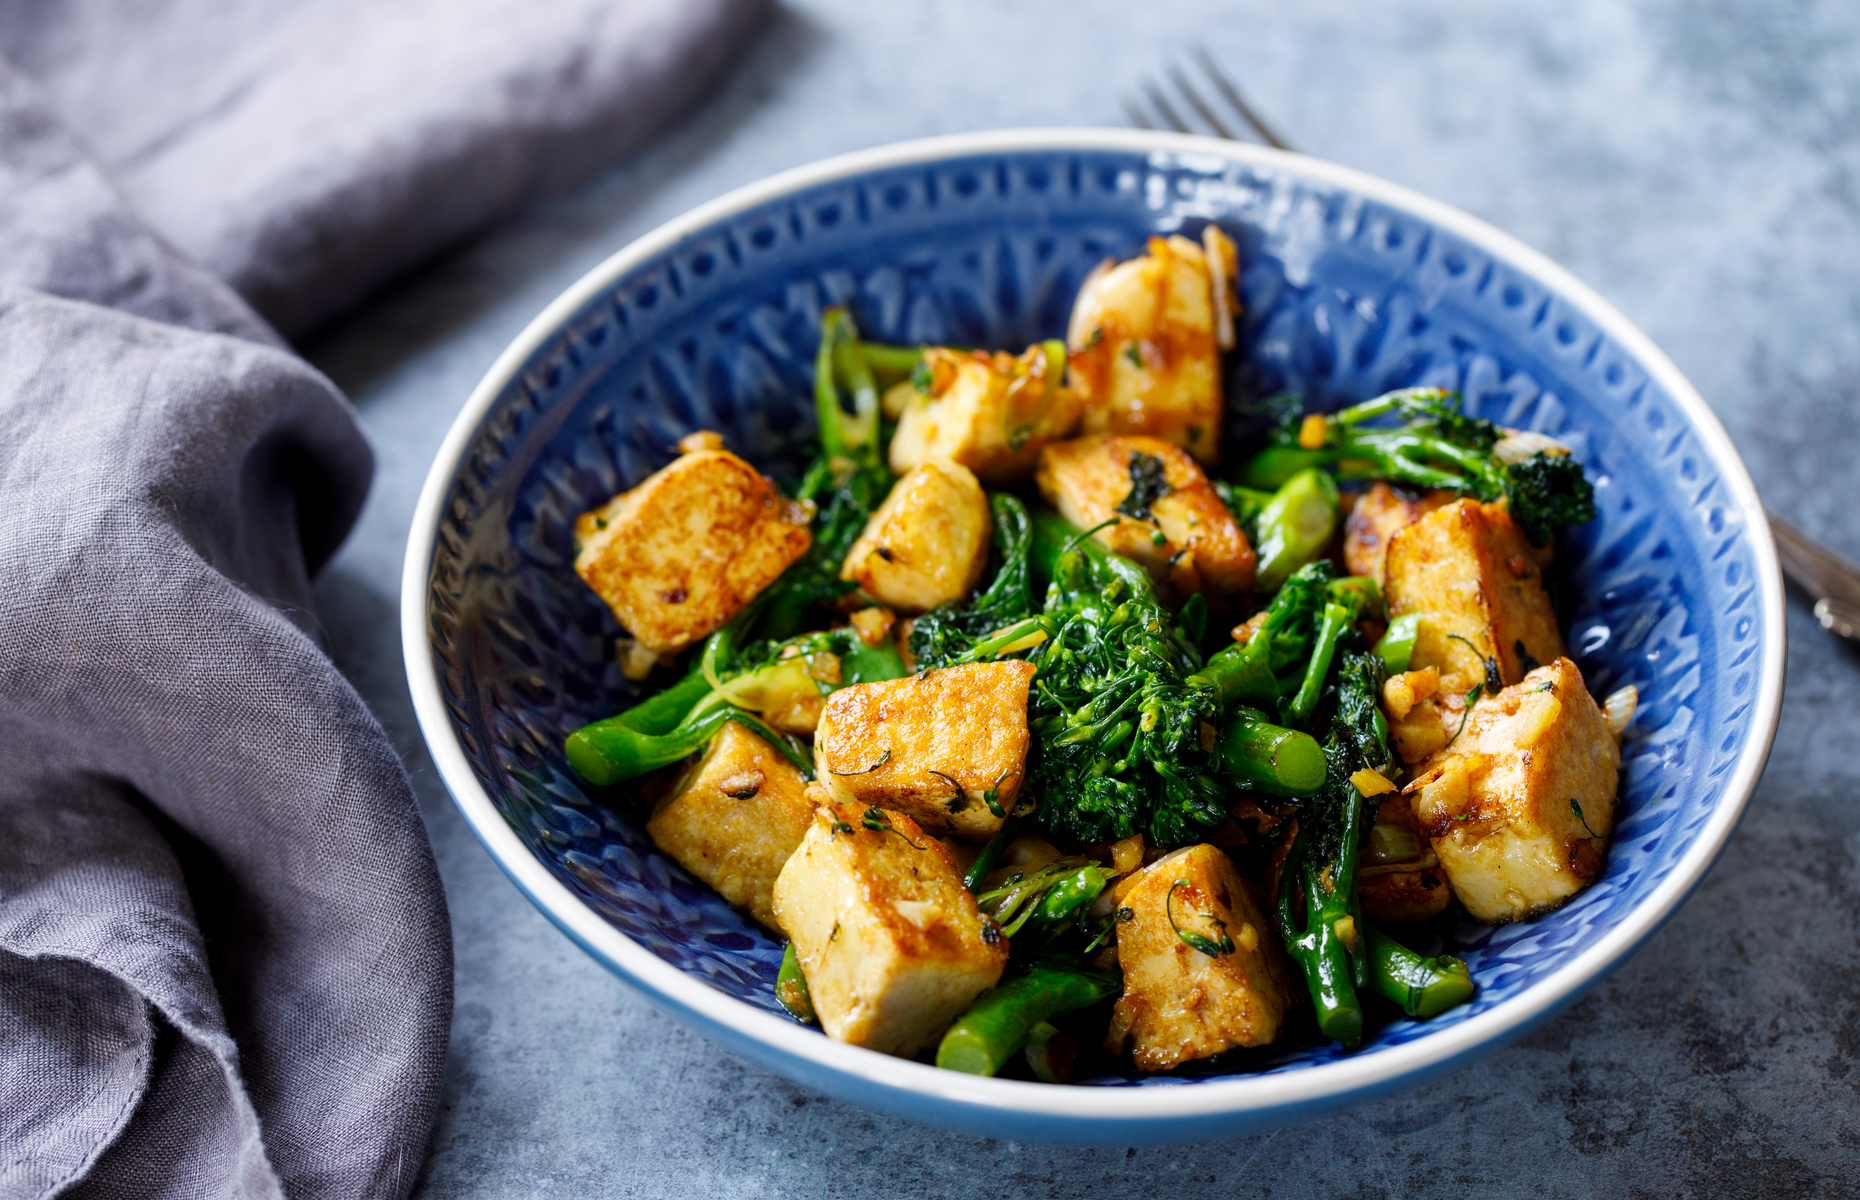 Tofu salad (Image: Magdanatka/Shutterstock)